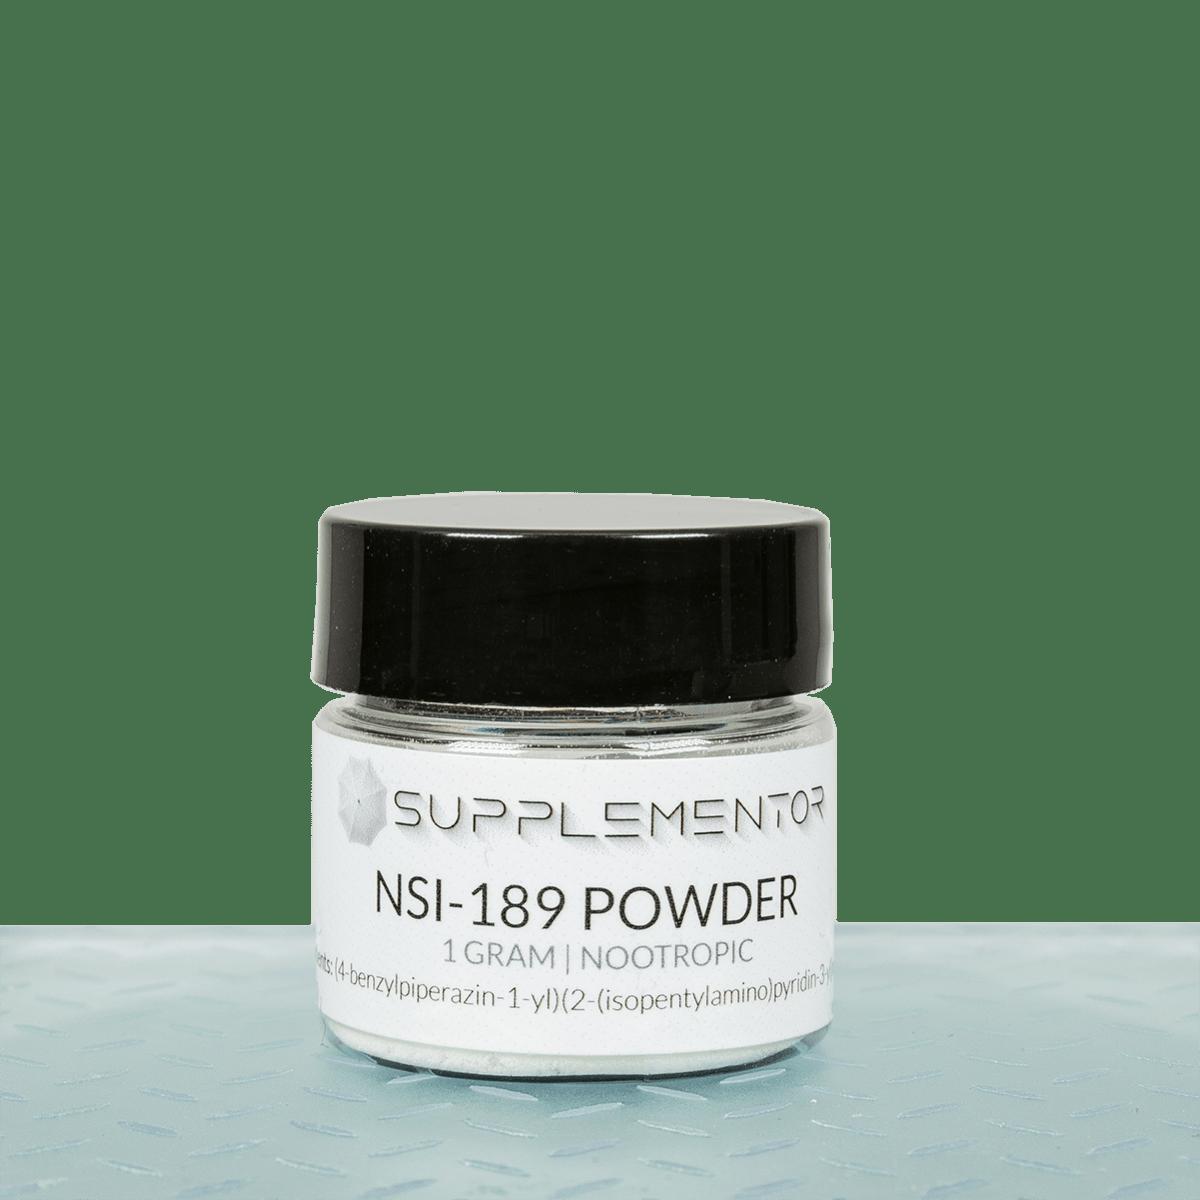 NSI-189 Powder Nootropic